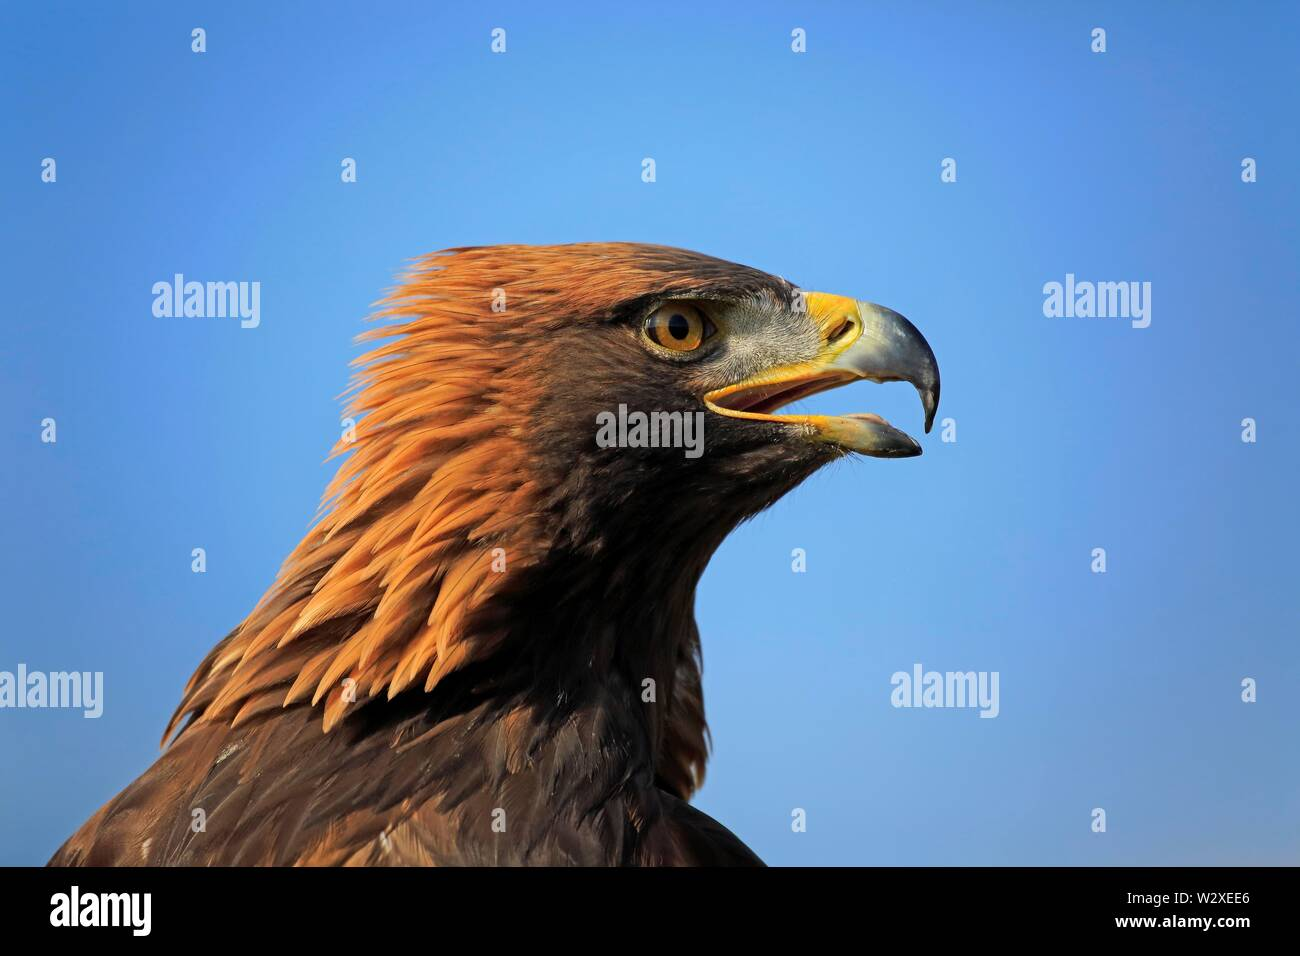 Golden eagle (Aquila chrysaetos), adult, calling, animal portrait, Slovakia - Stock Image